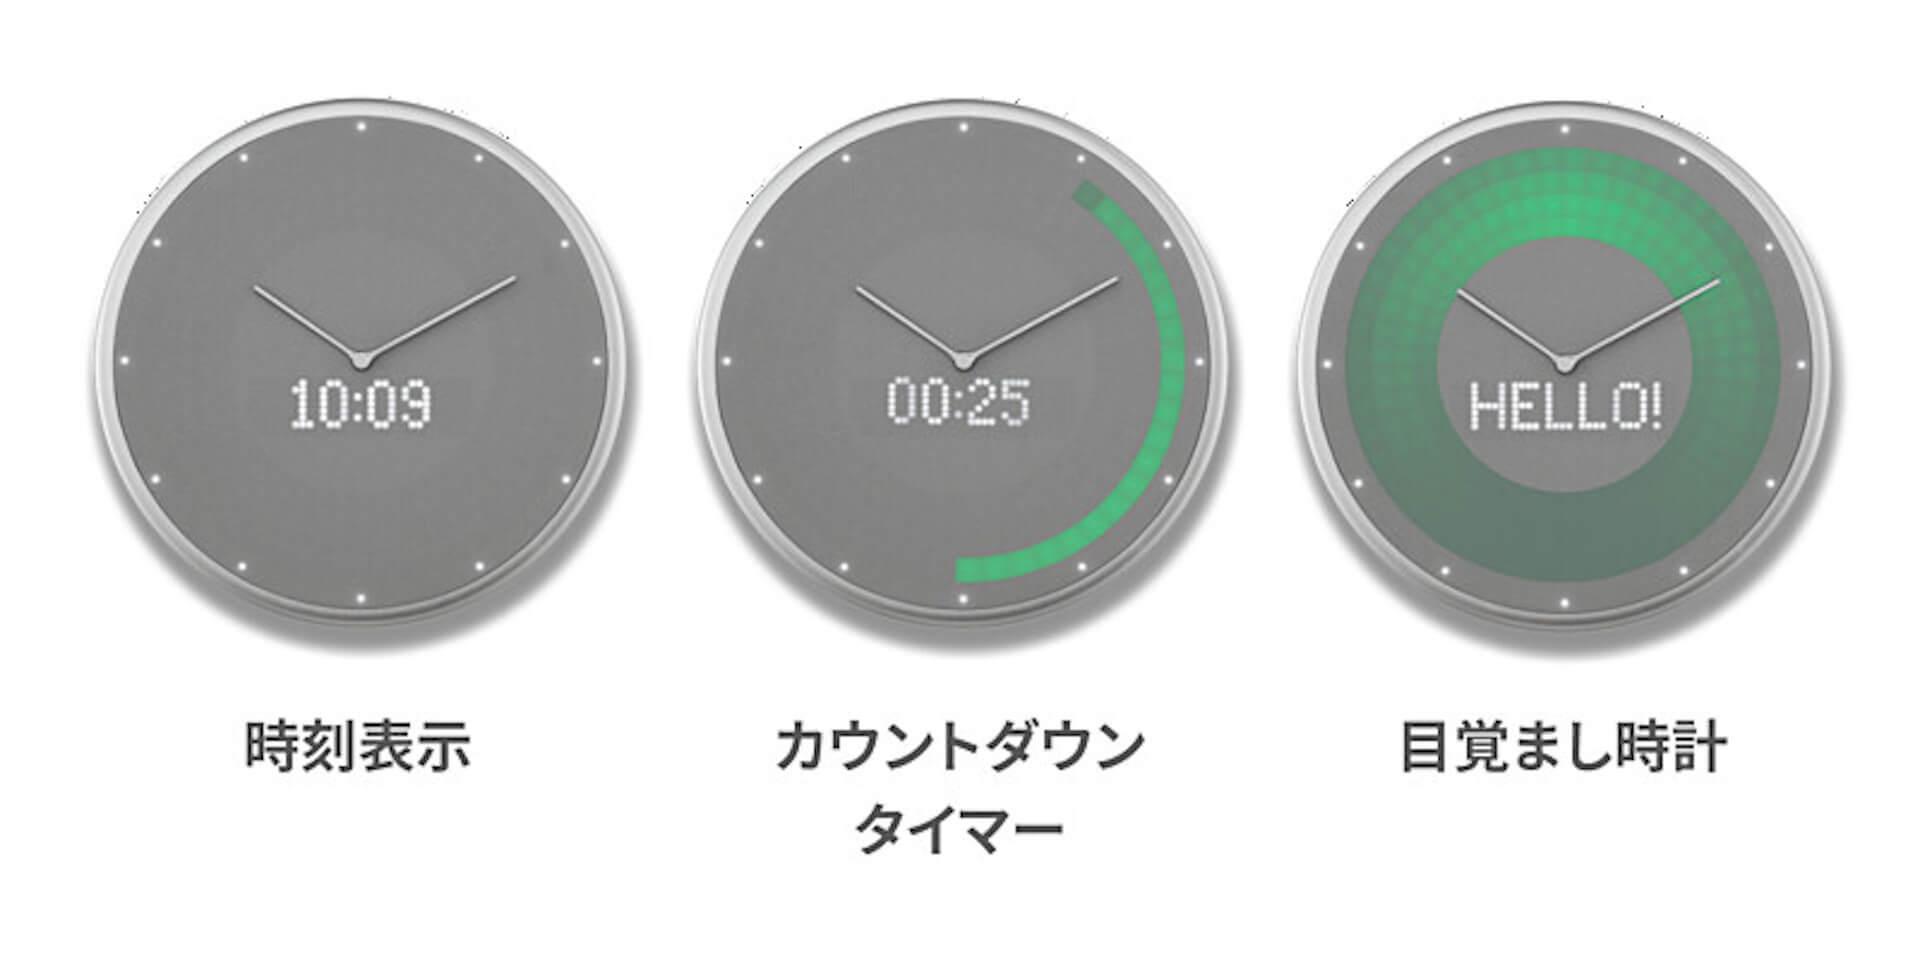 Google・Apple同期でスケジュール管理|忙しい日常をサポートするIoT掛け時計「Glance Clock」が登場 tech190904glanceclock_5